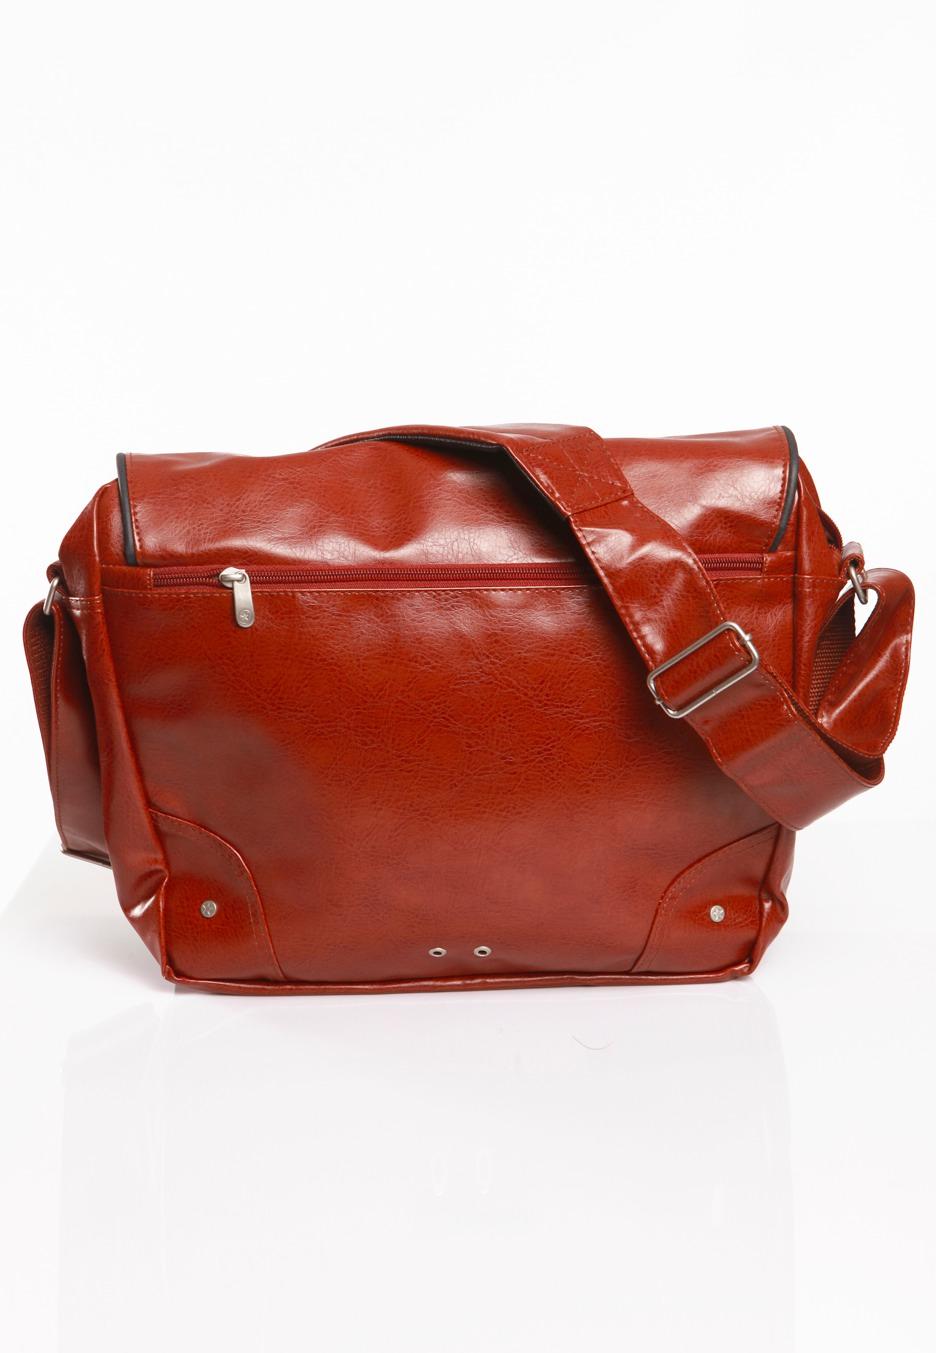 Converse - Retro Large Light Cognac - Bag - Impericon.com UK c6516c3403